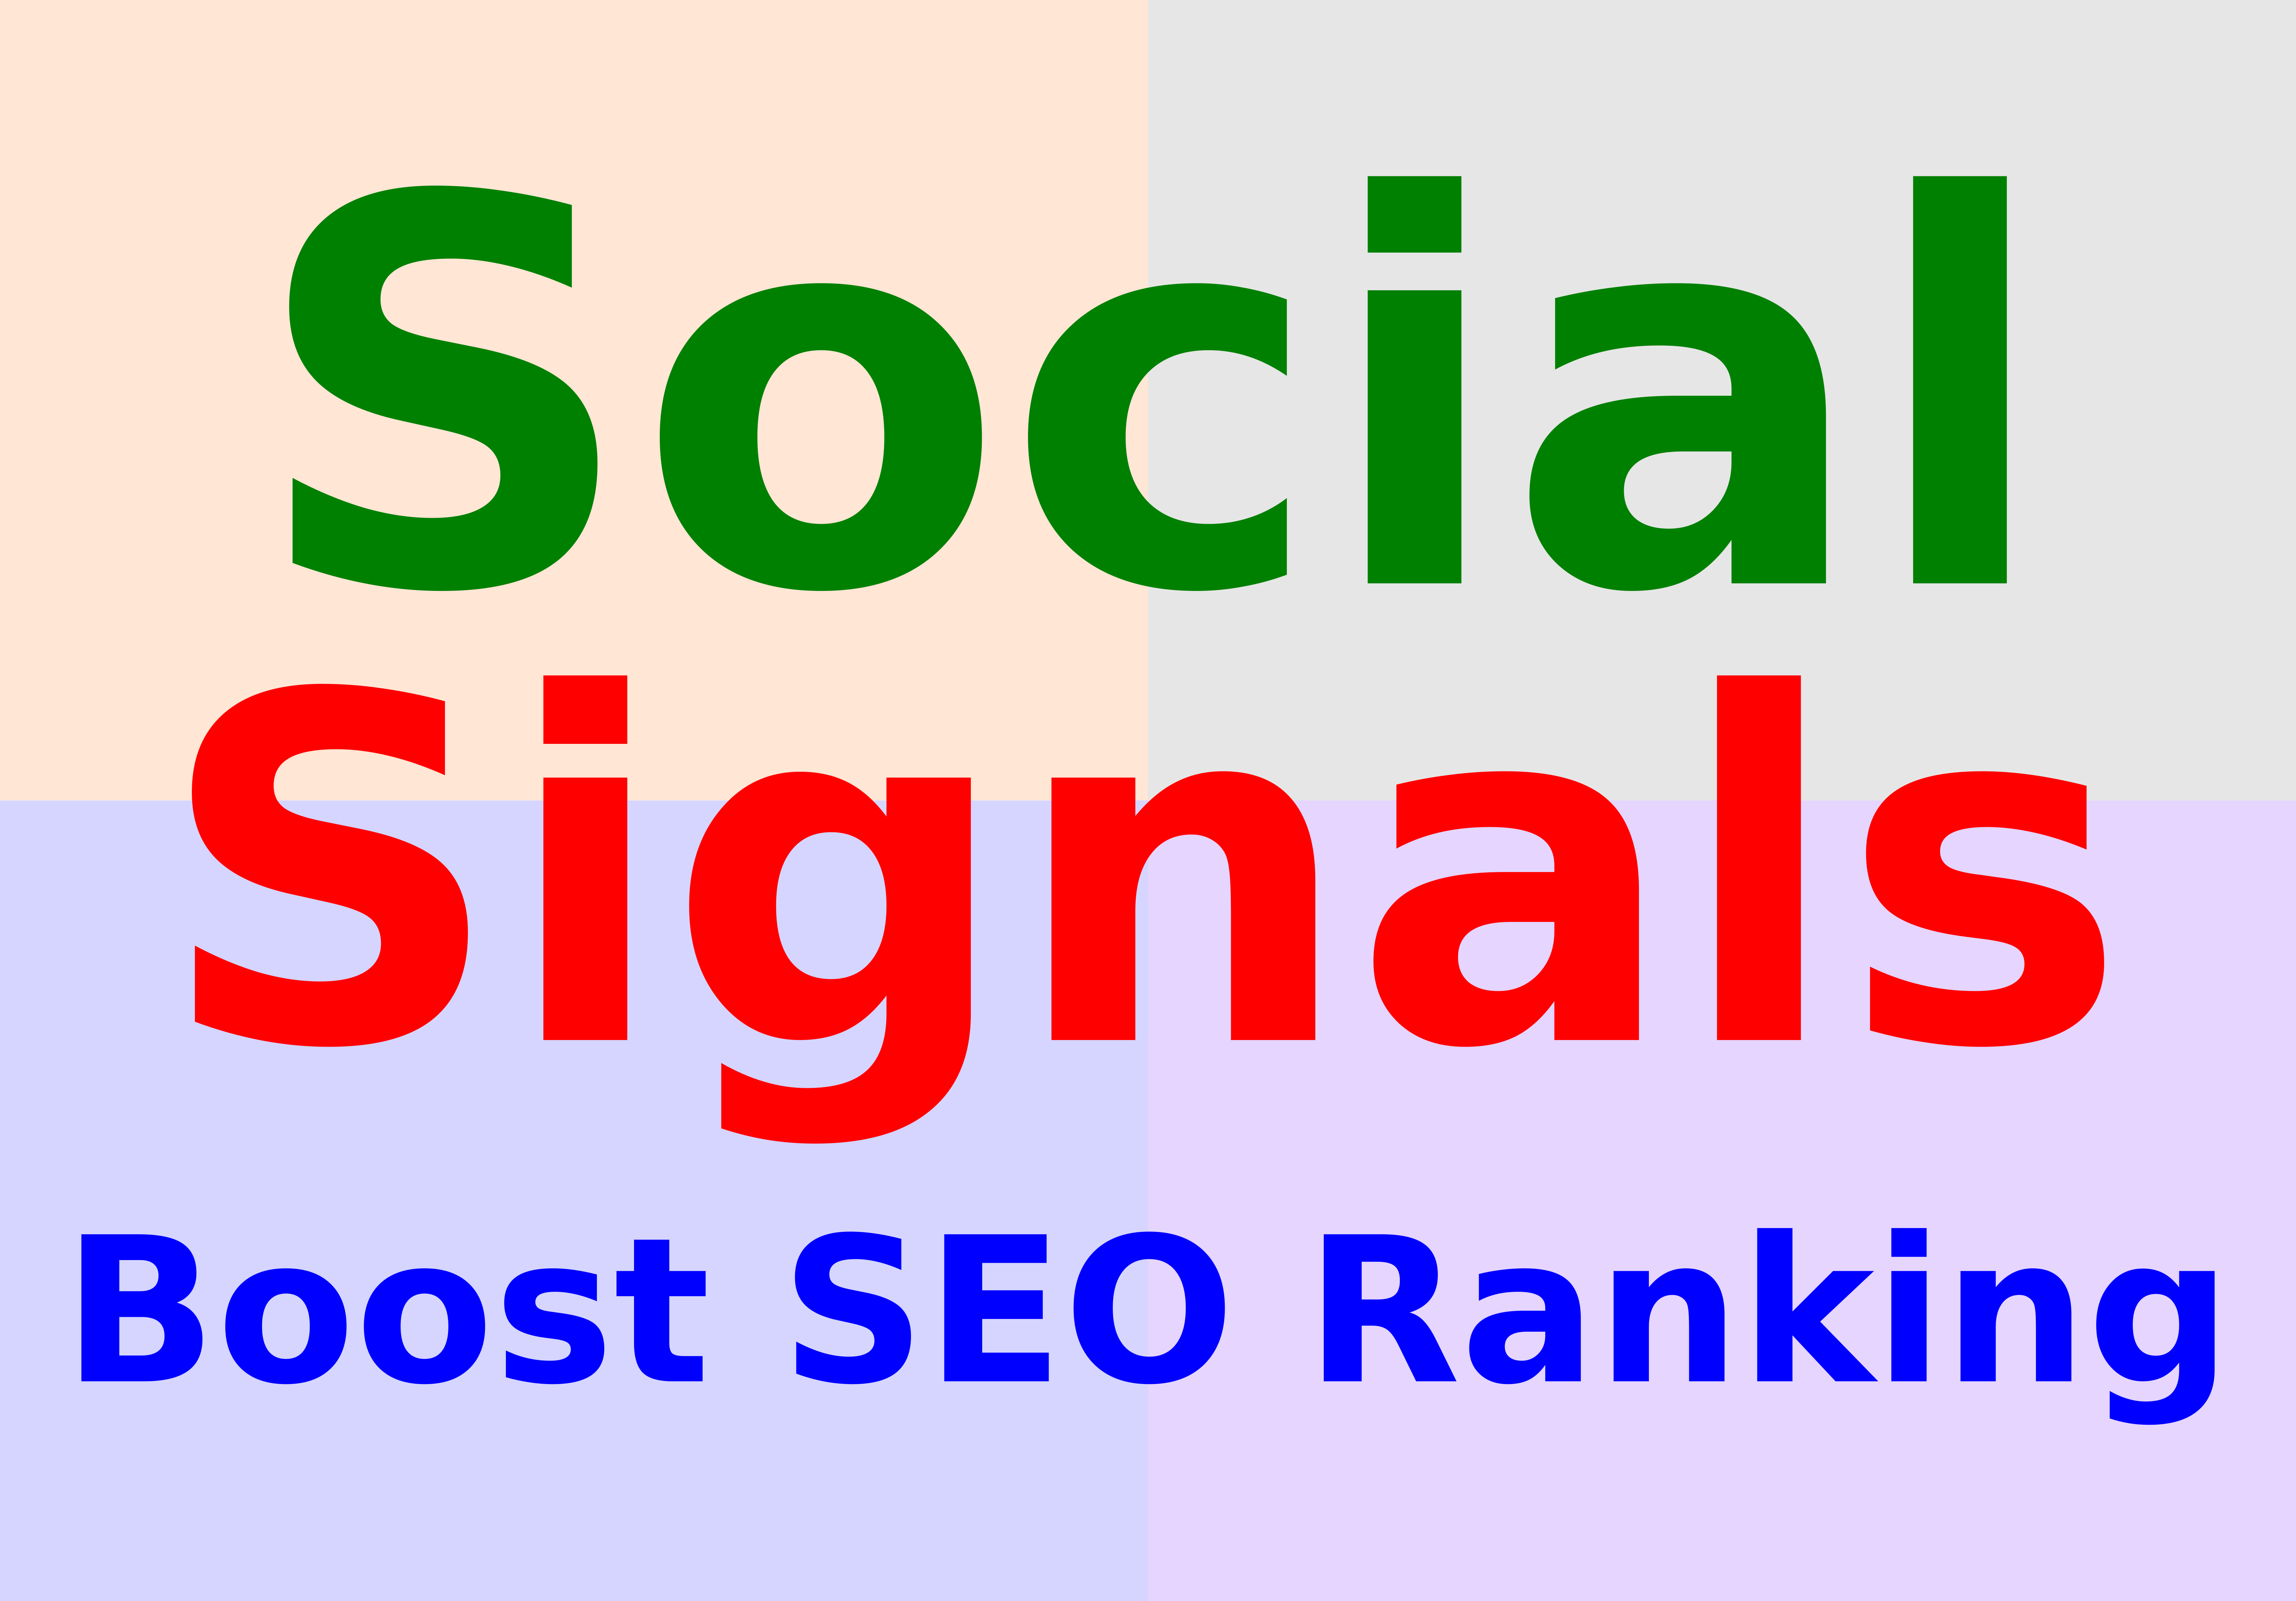 Boost SEO ranking using 2000 organic social signals